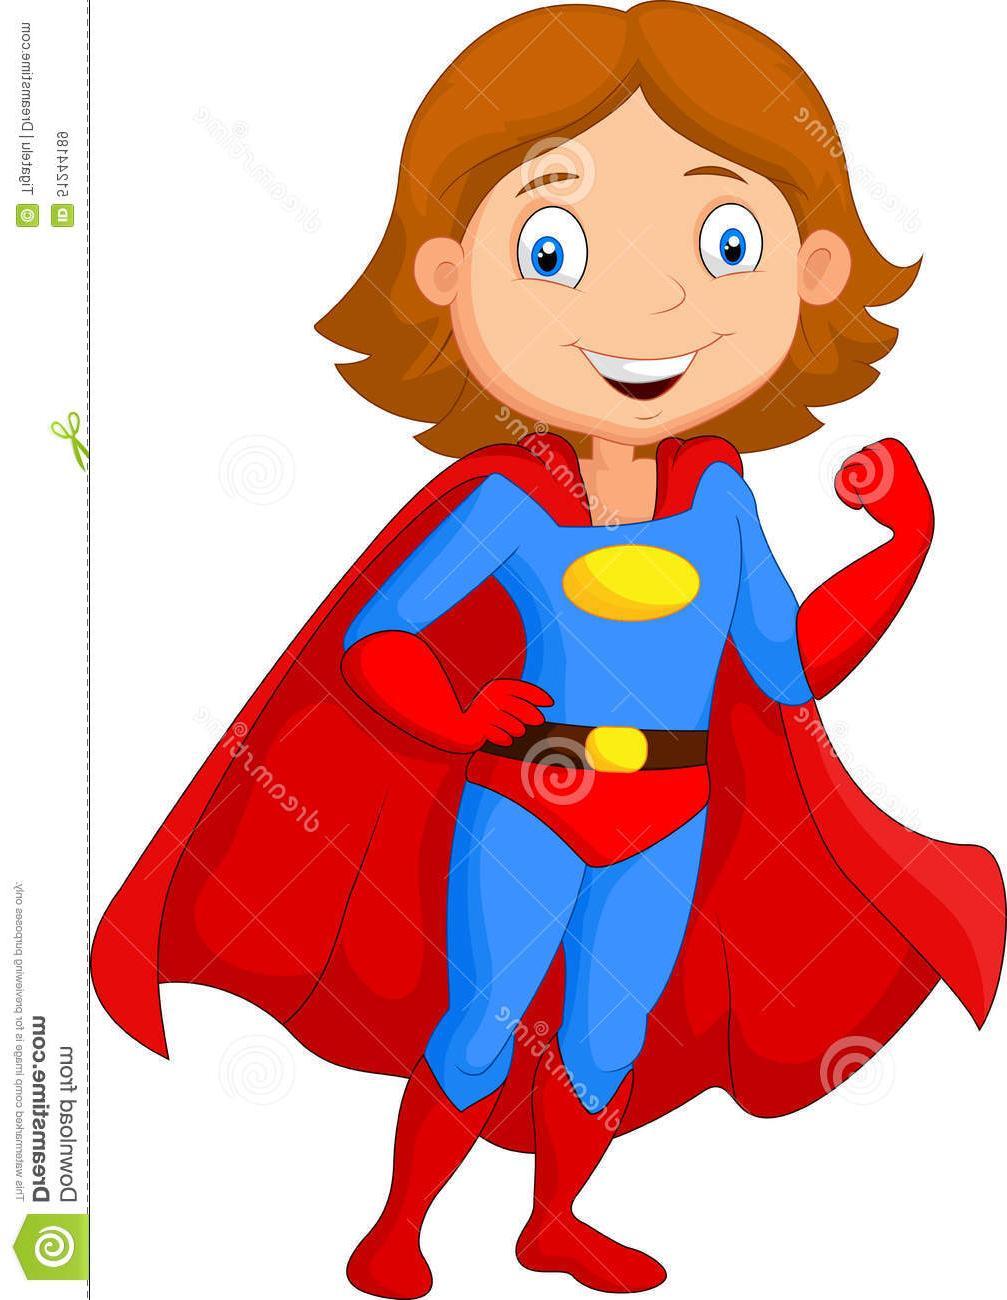 Female superhero clipart free jpg free stock Unique Female Superhero Clip Art Drawing » Free Vector Art, Images ... jpg free stock